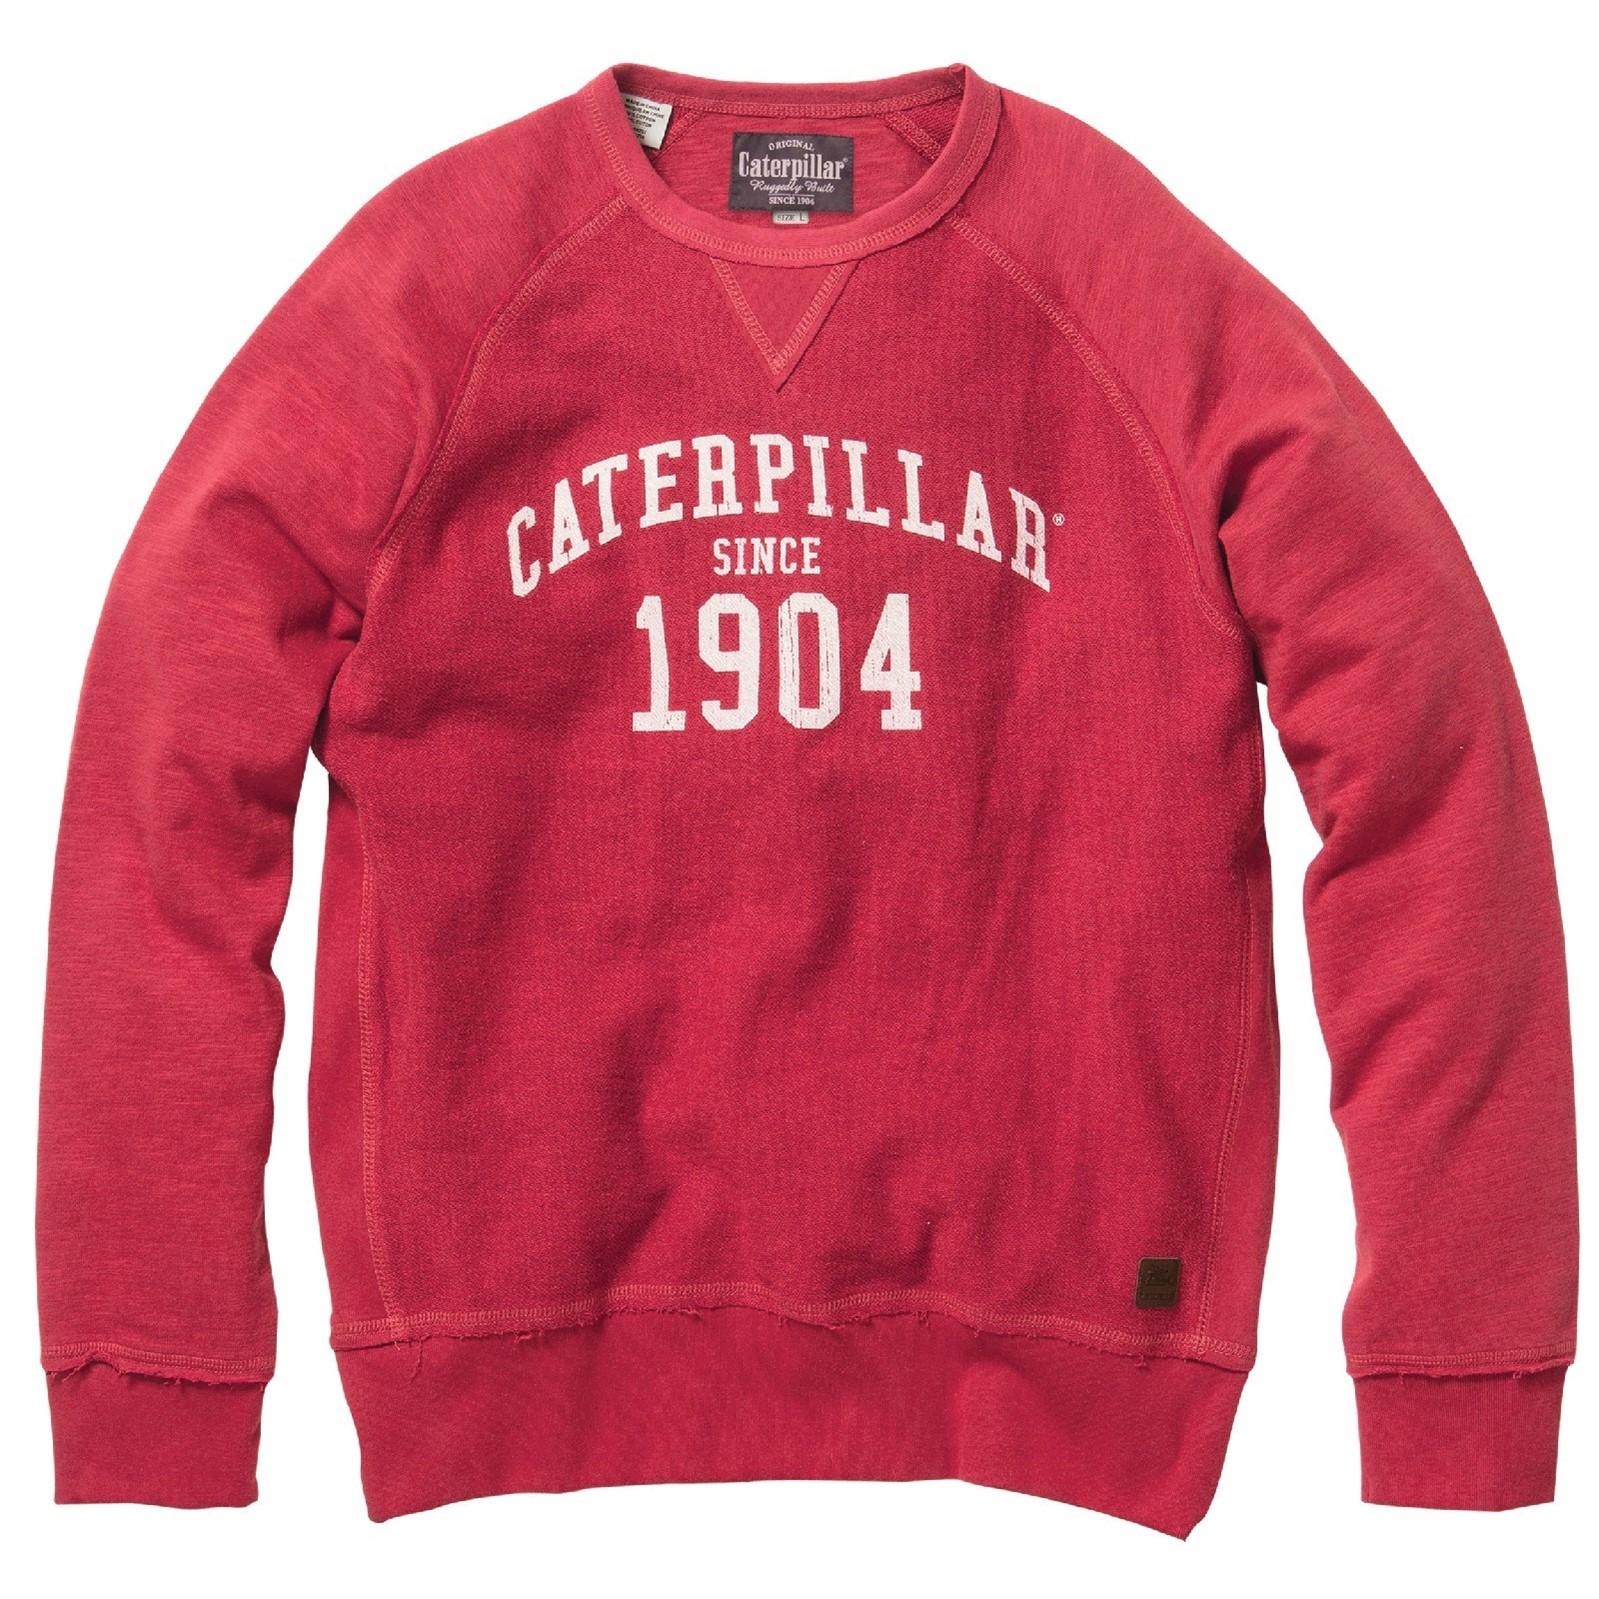 CAT-Lifestyle-Mens-1904-Sweatshirt-FS5366